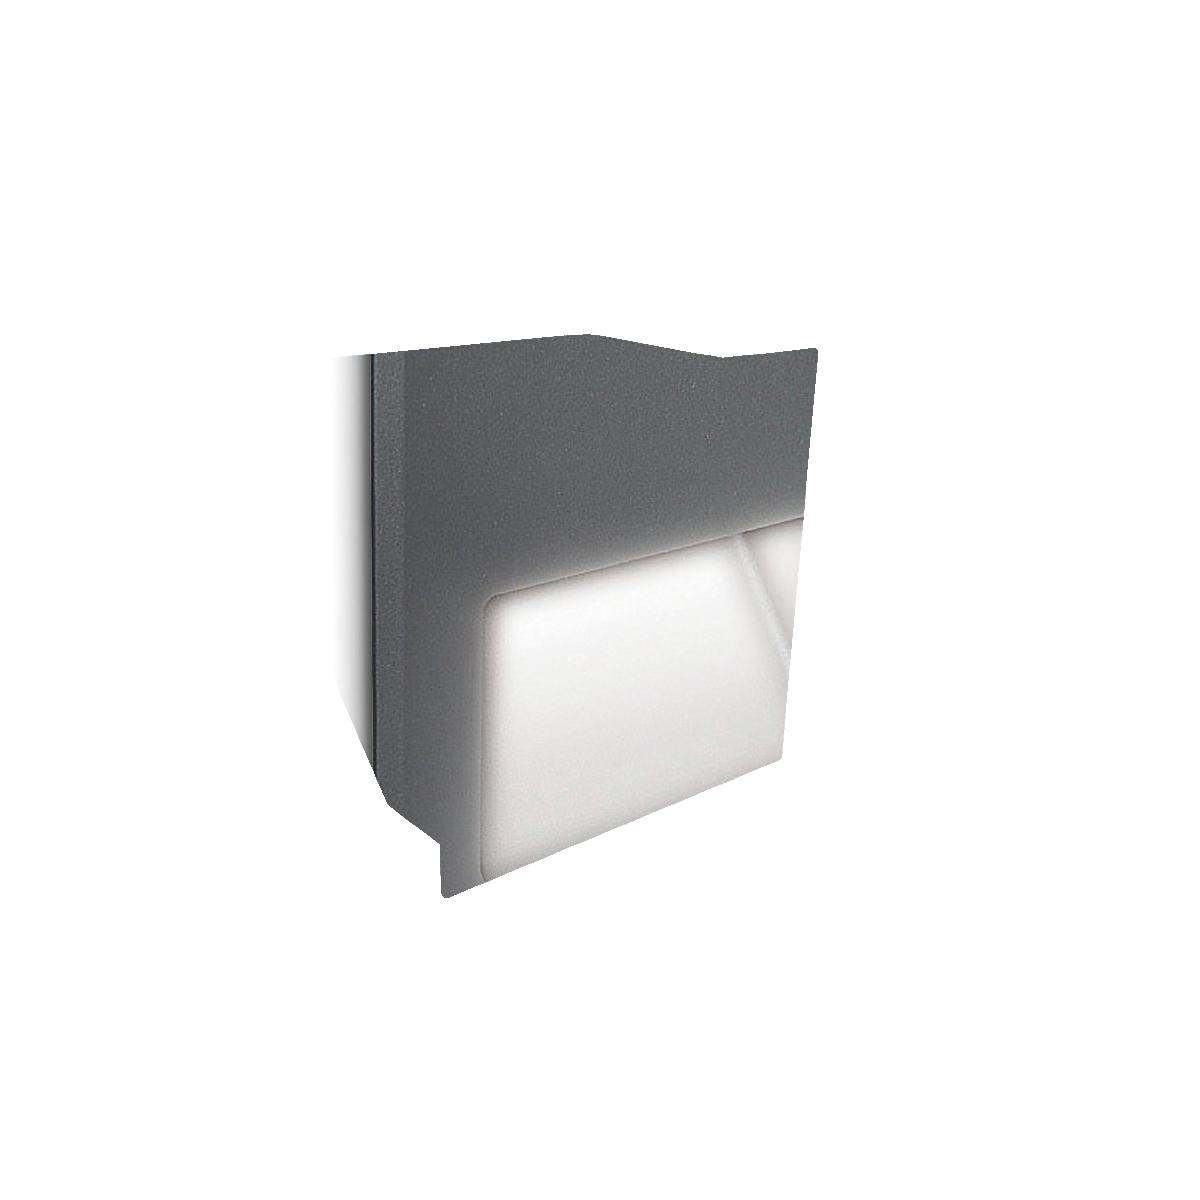 Lighting Basement Washroom Stairs: LED Step-Light Markers Inground And Underwater